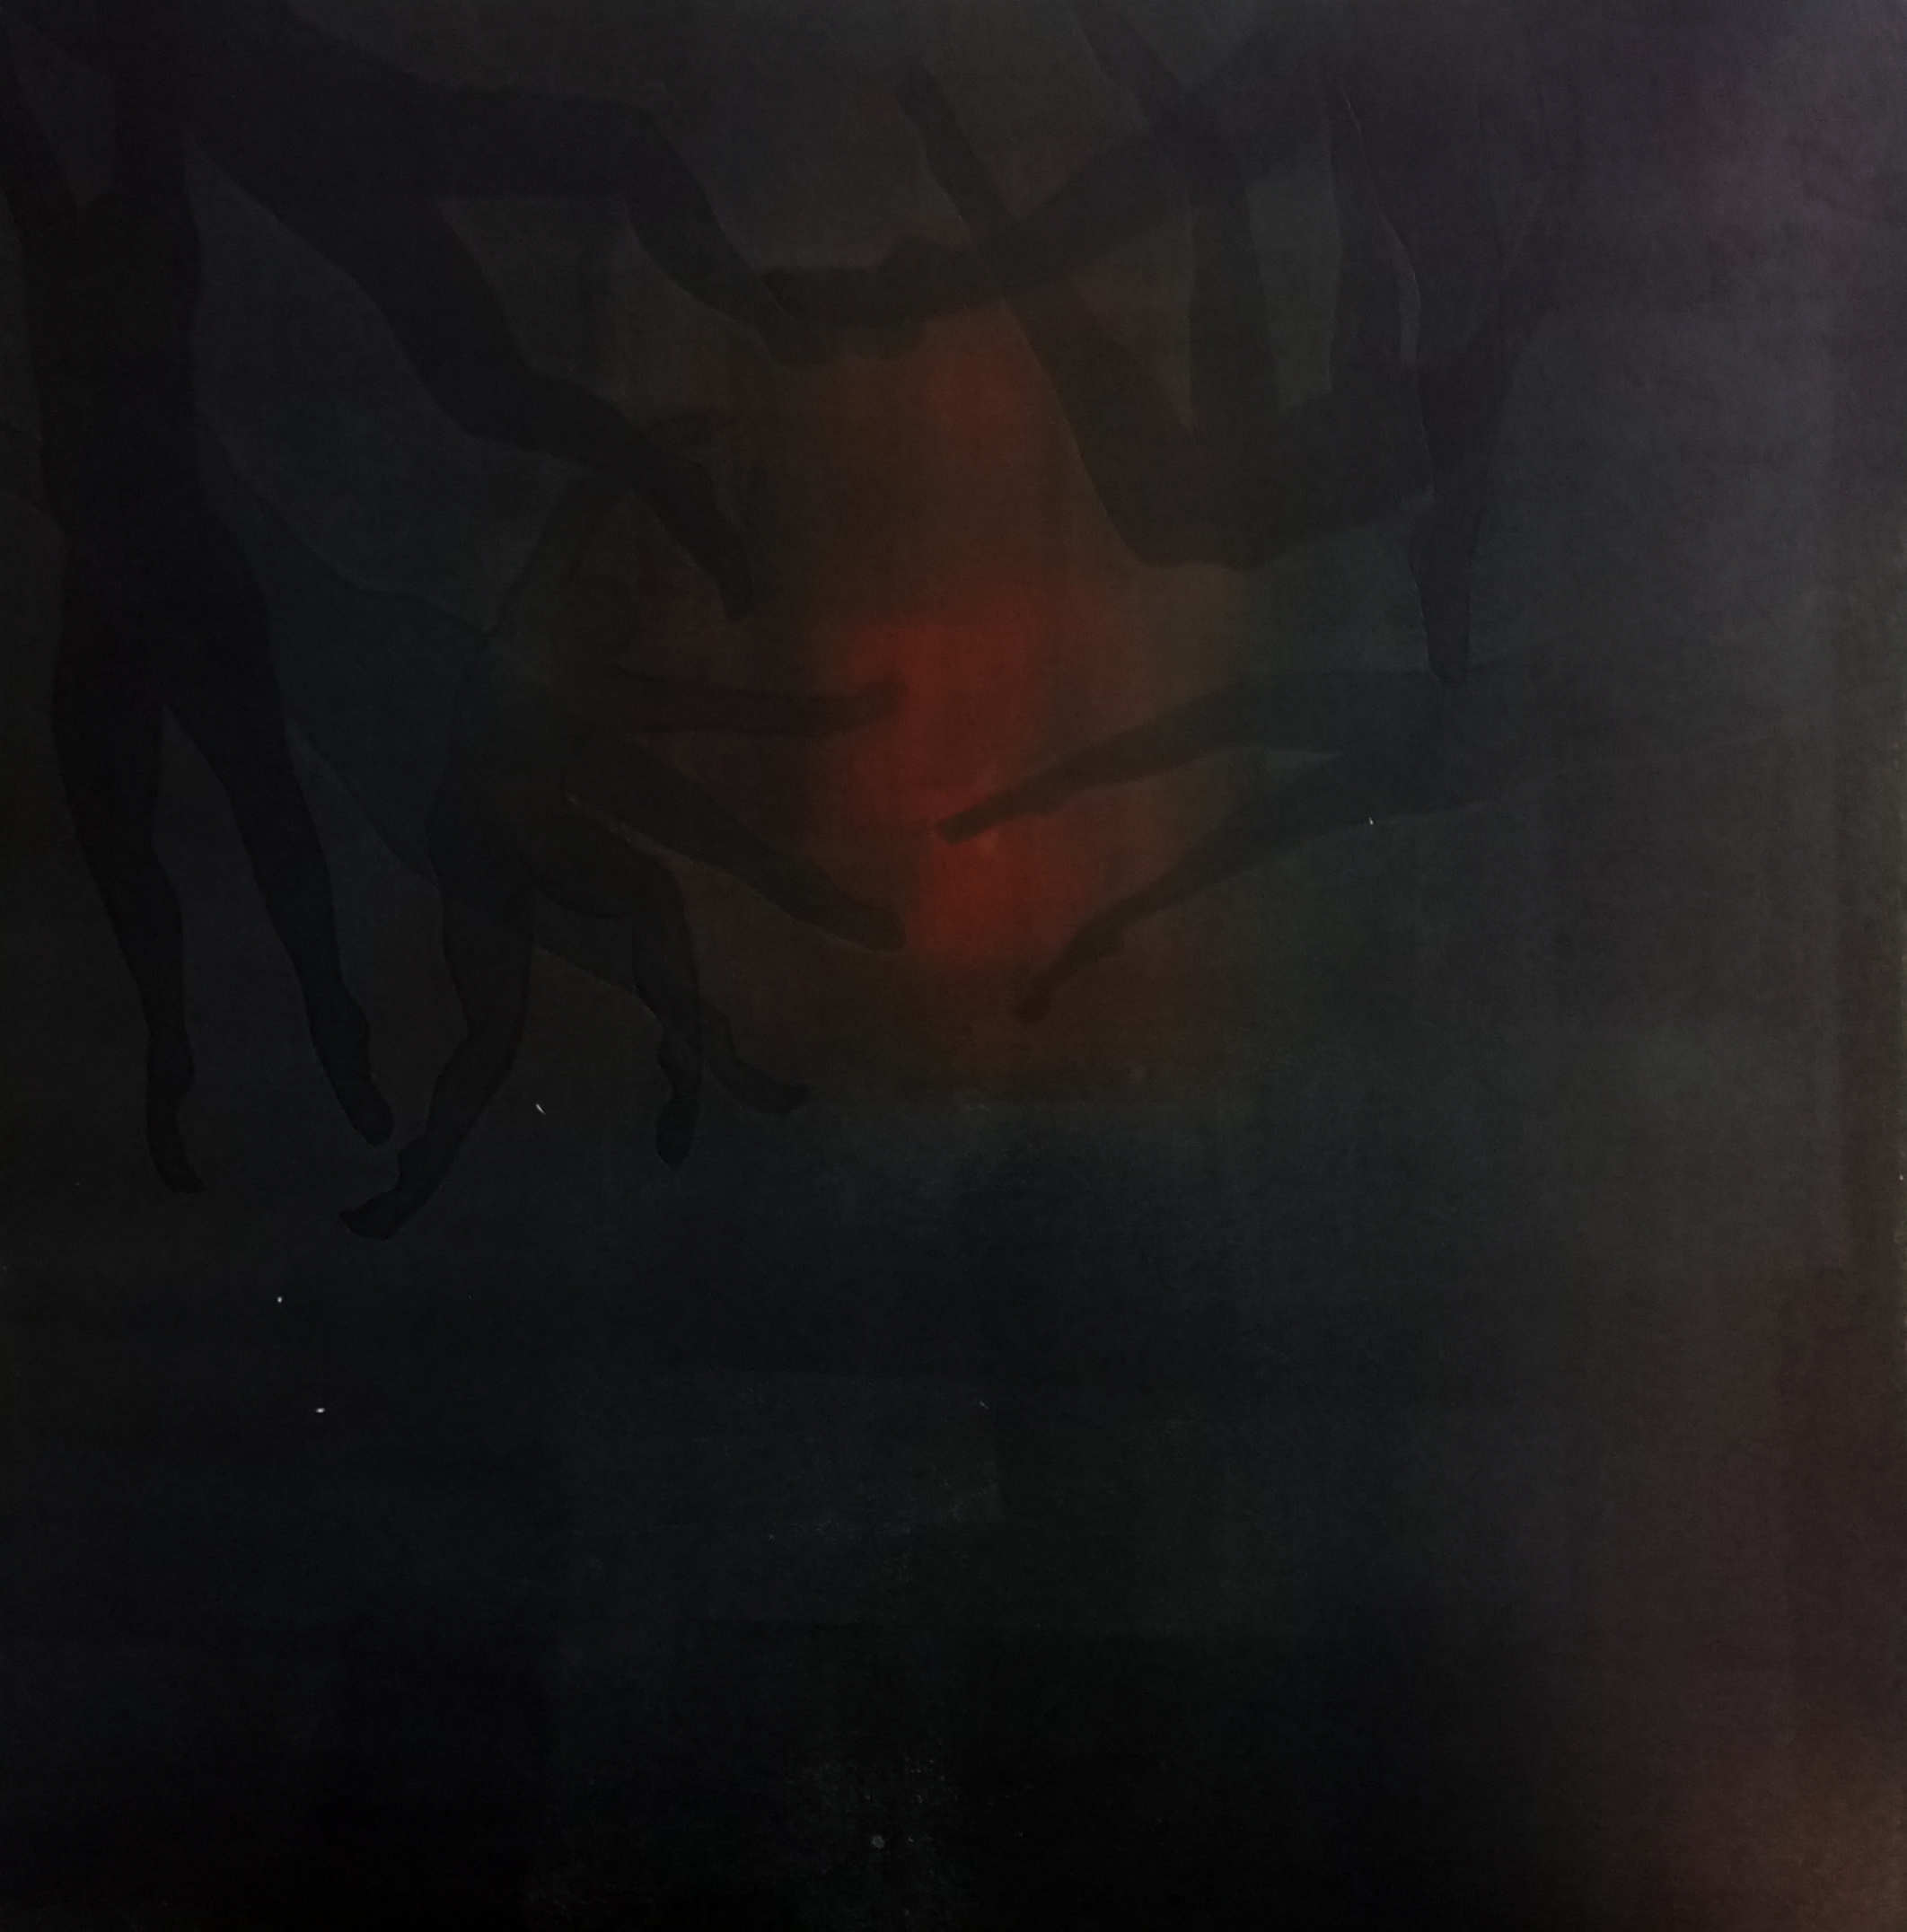 Monoprint and Monotype on Hanhemuhle, 30 x 30cm